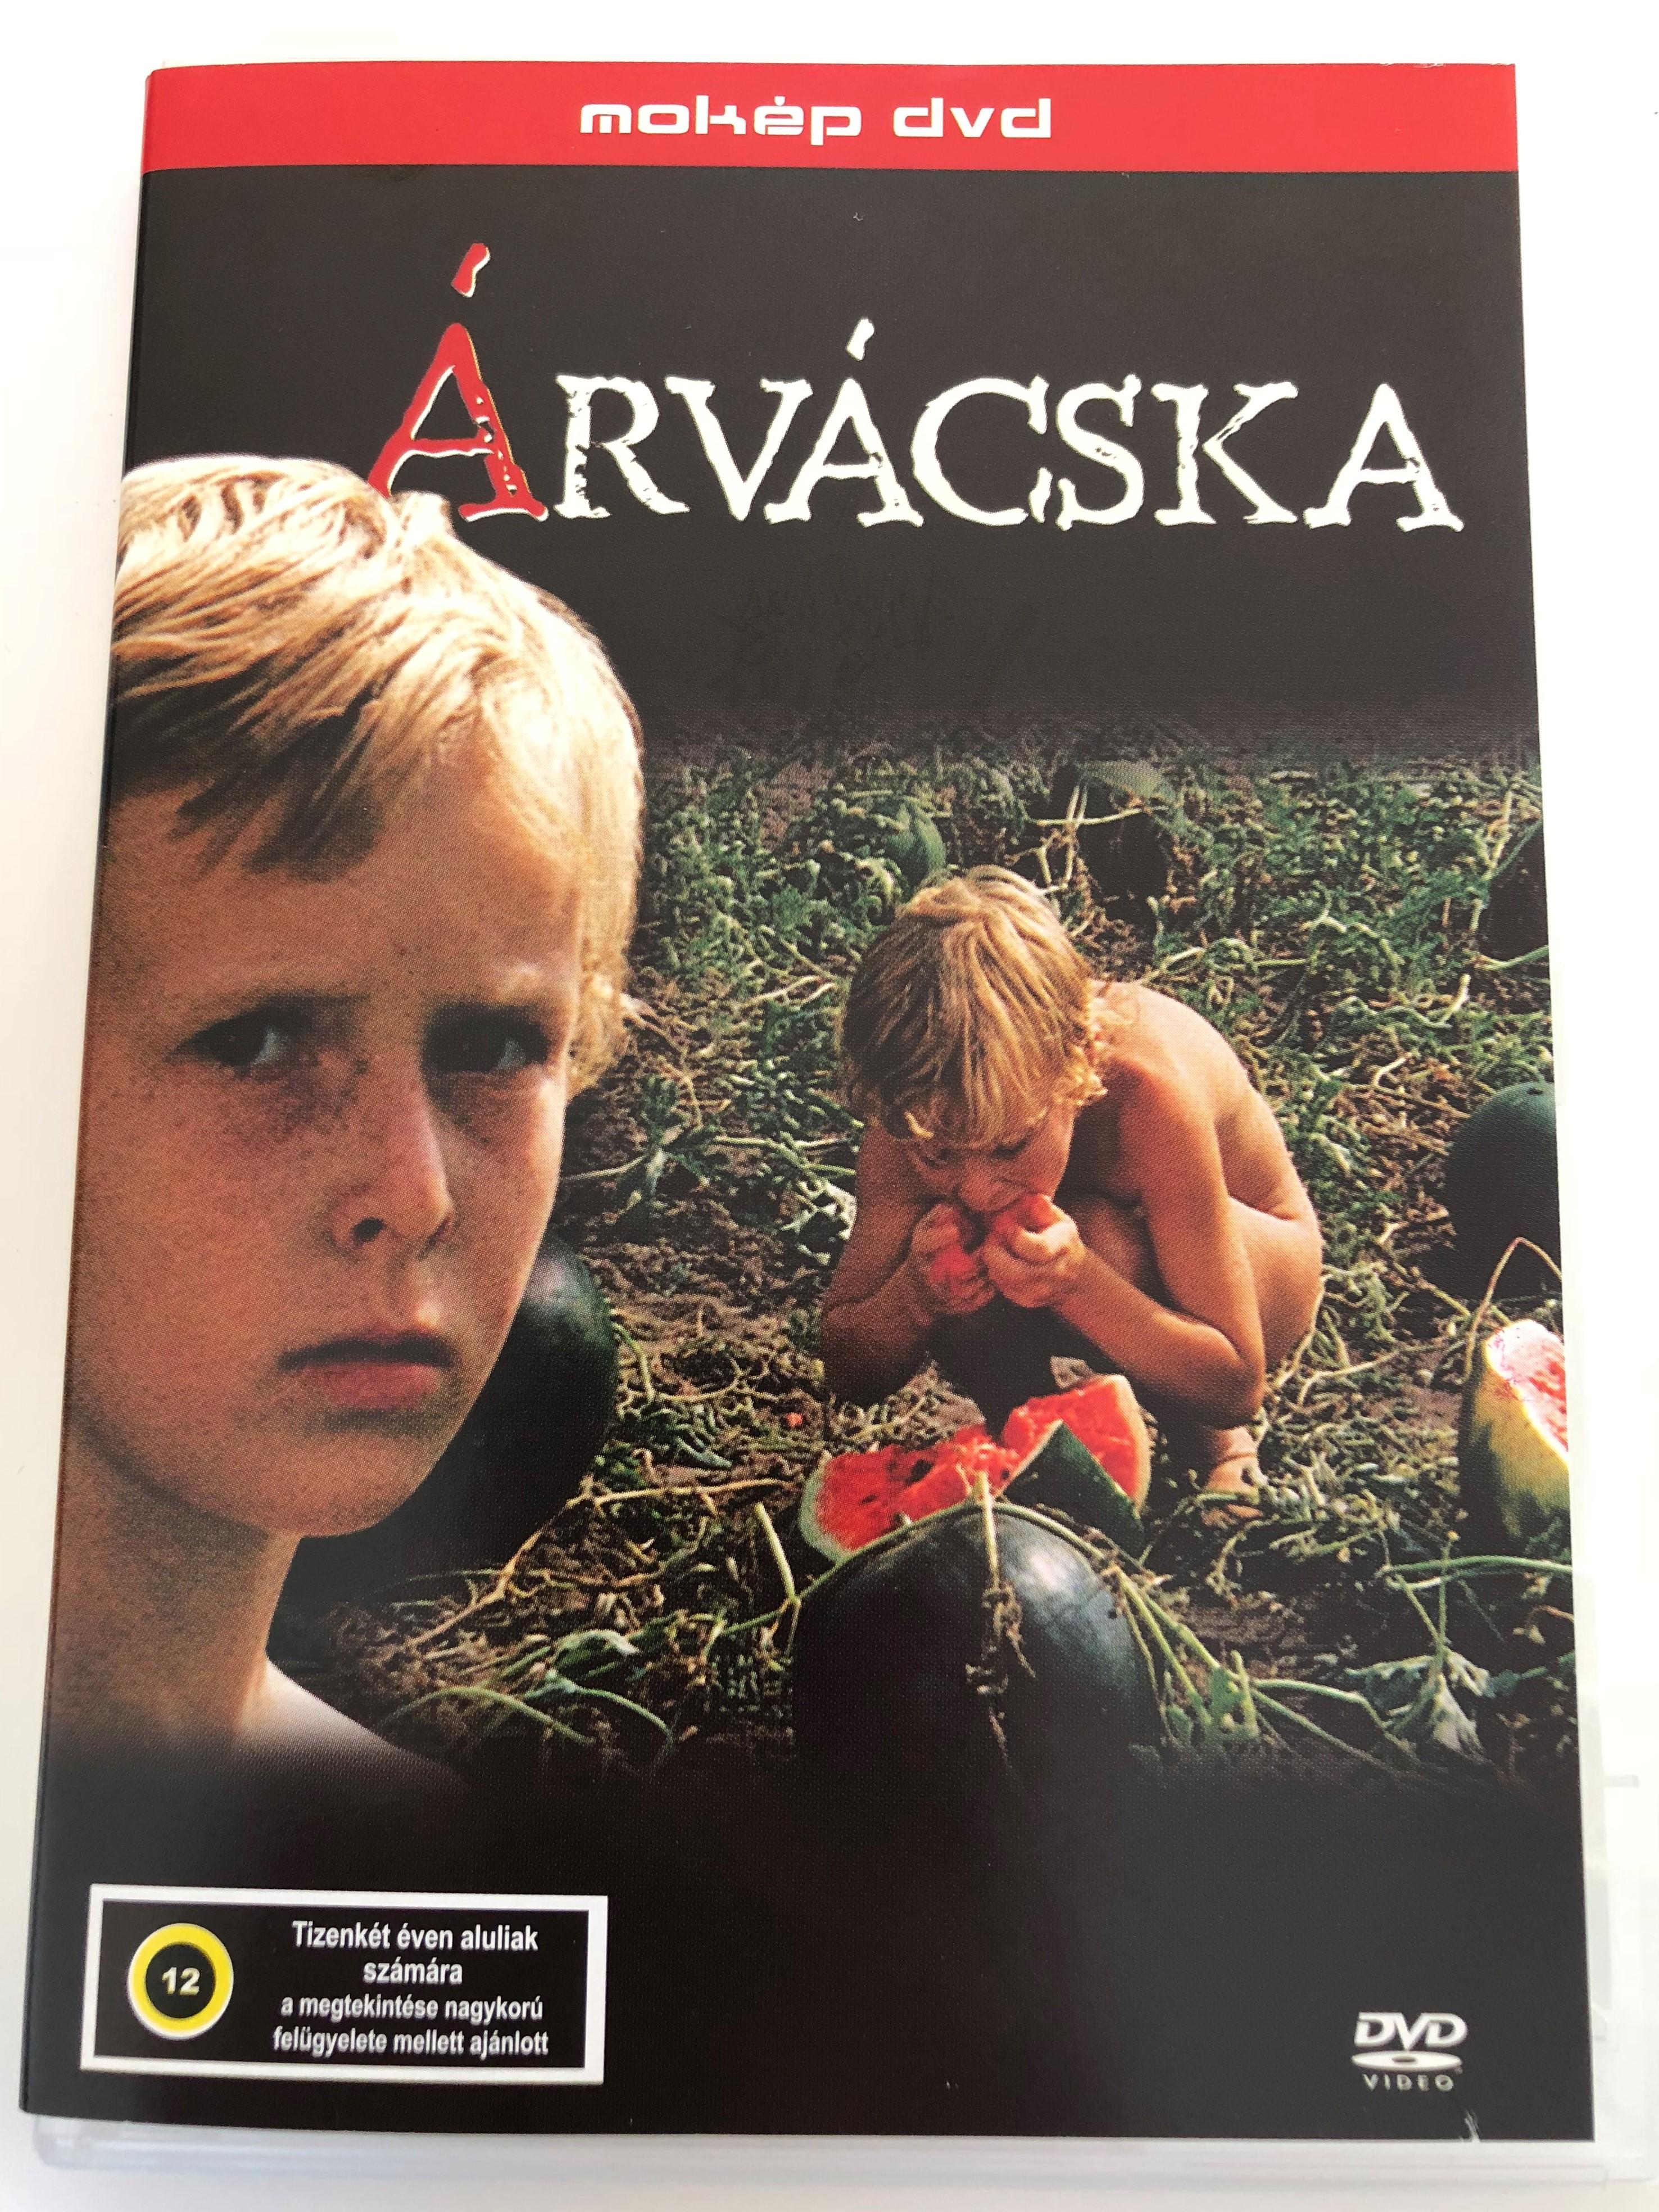 -rv-cska-dvd-1976-orphan-directed-by-ran-dy-l-szl-1-.jpg